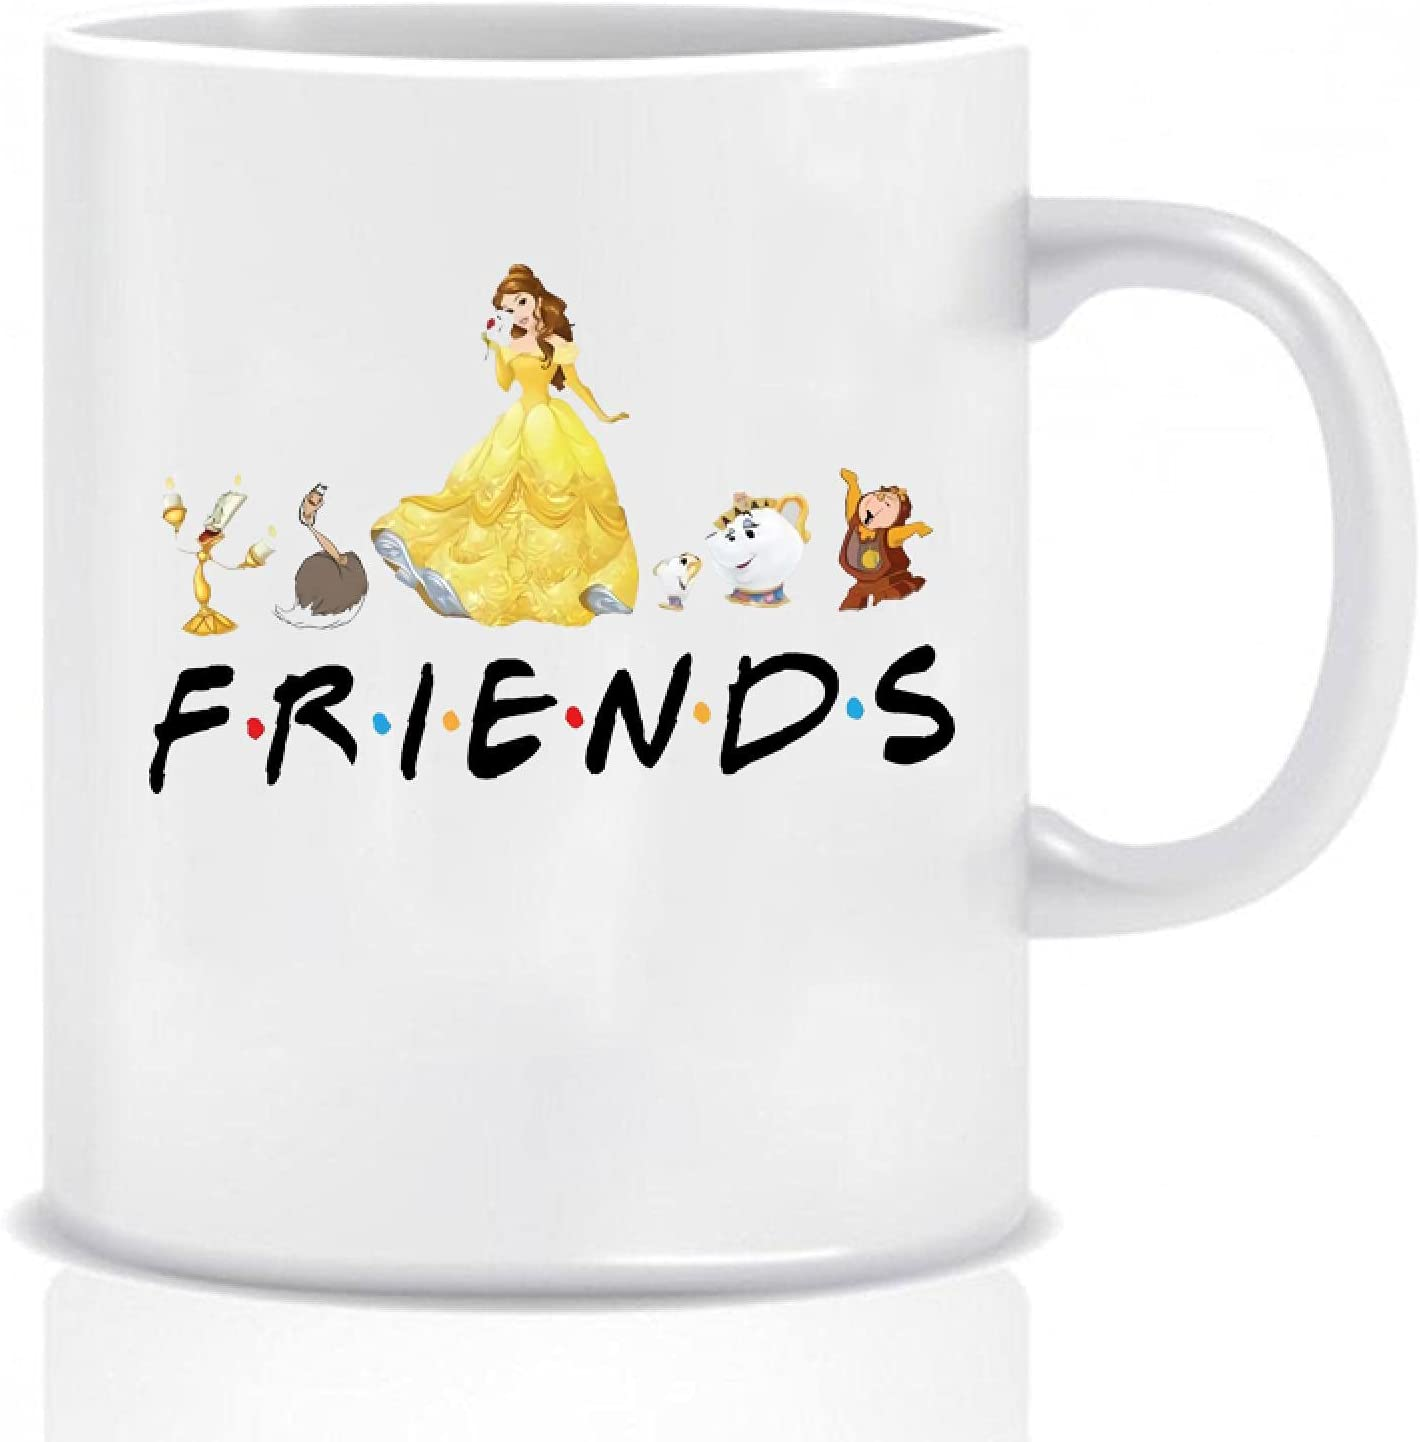 Beautiful Beast Friends Mug Cheap sale Funny Coffe And Mu Max 72% OFF Belle Her